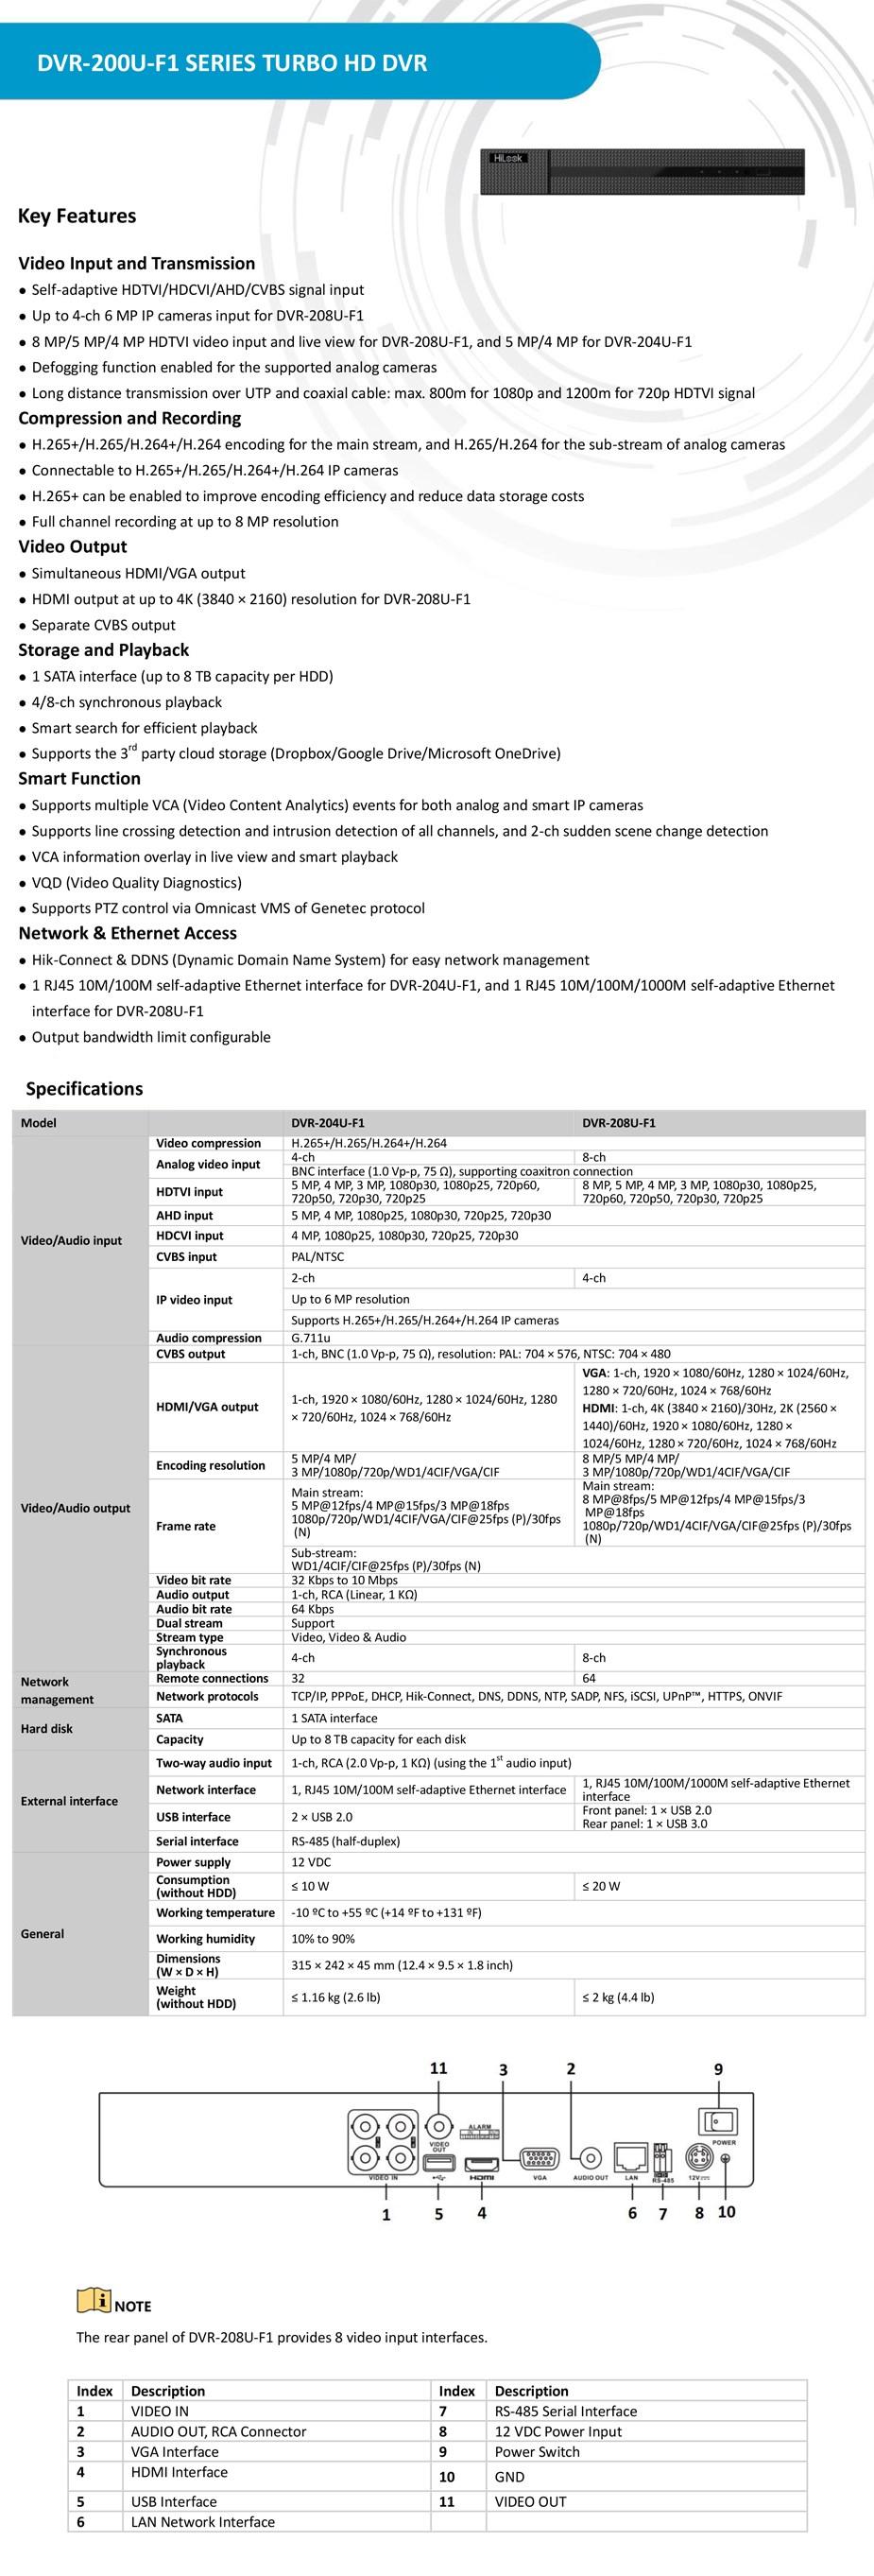 HiLook DVR-204U-F1 4CH Turbo HD-TVI/AHD/CVI/CVBS DVR - Desktop Overview 1